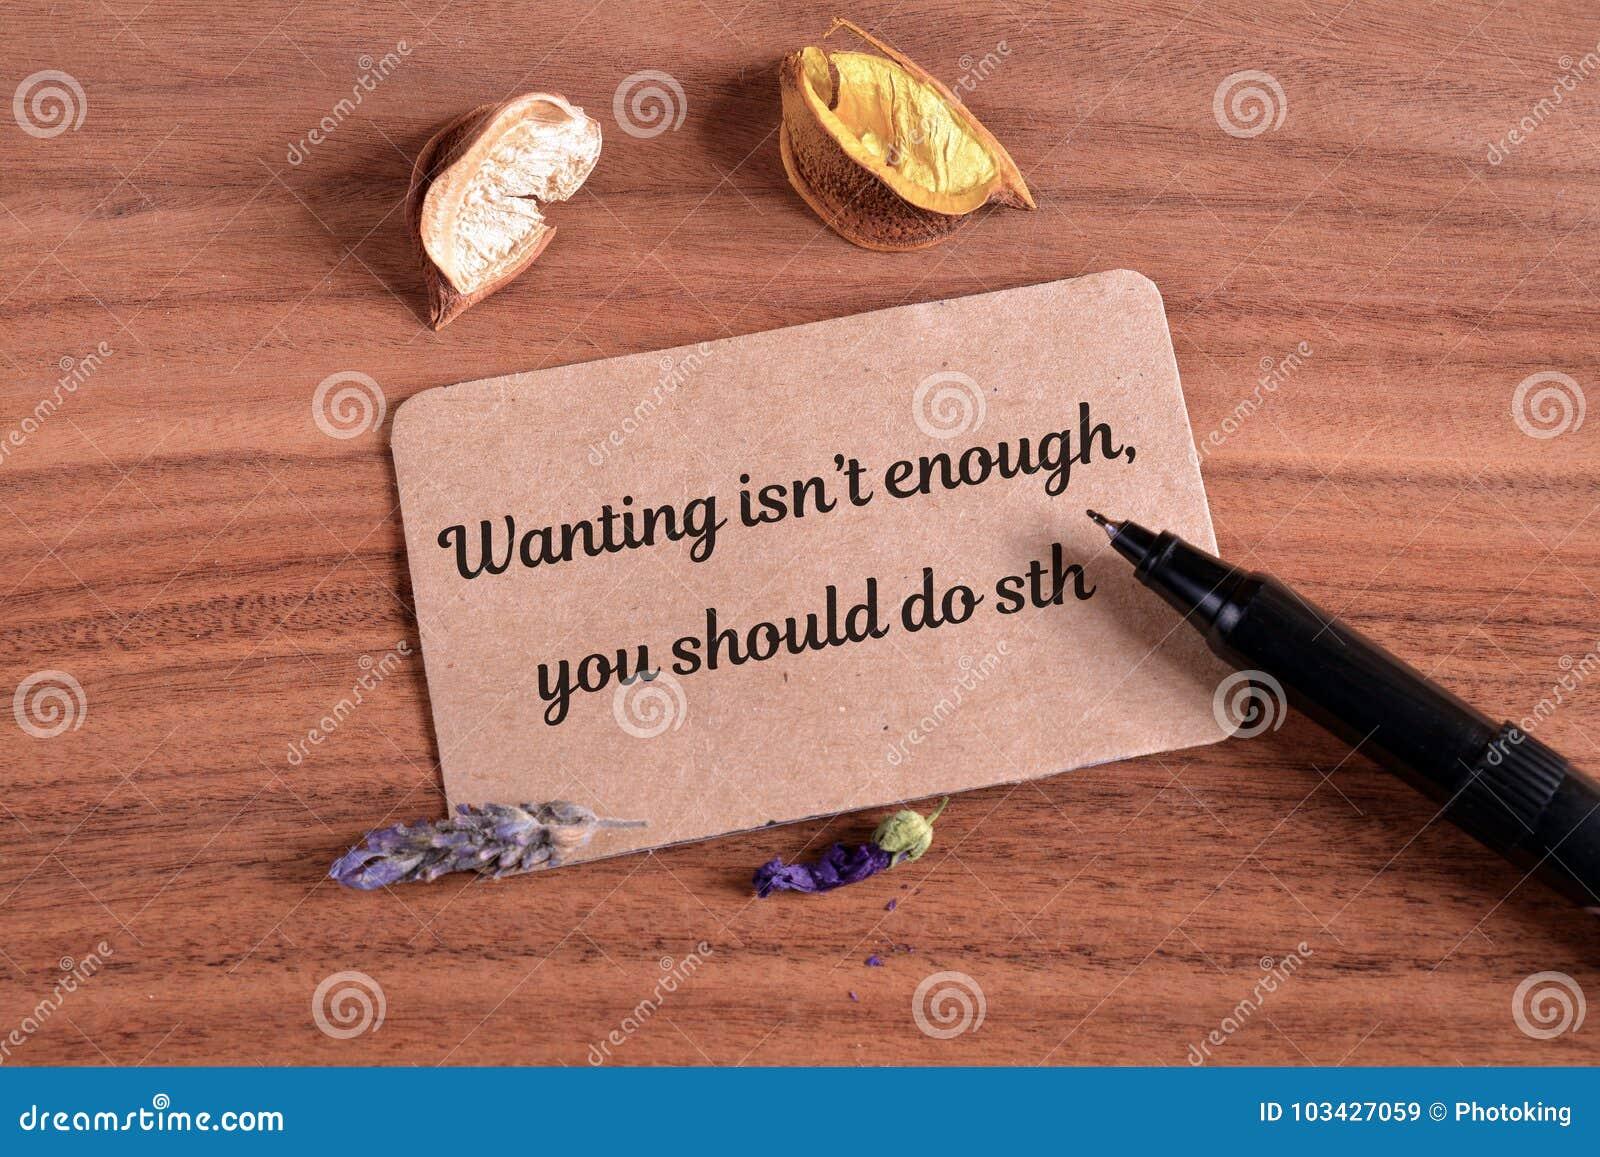 Wanting isn`t enough